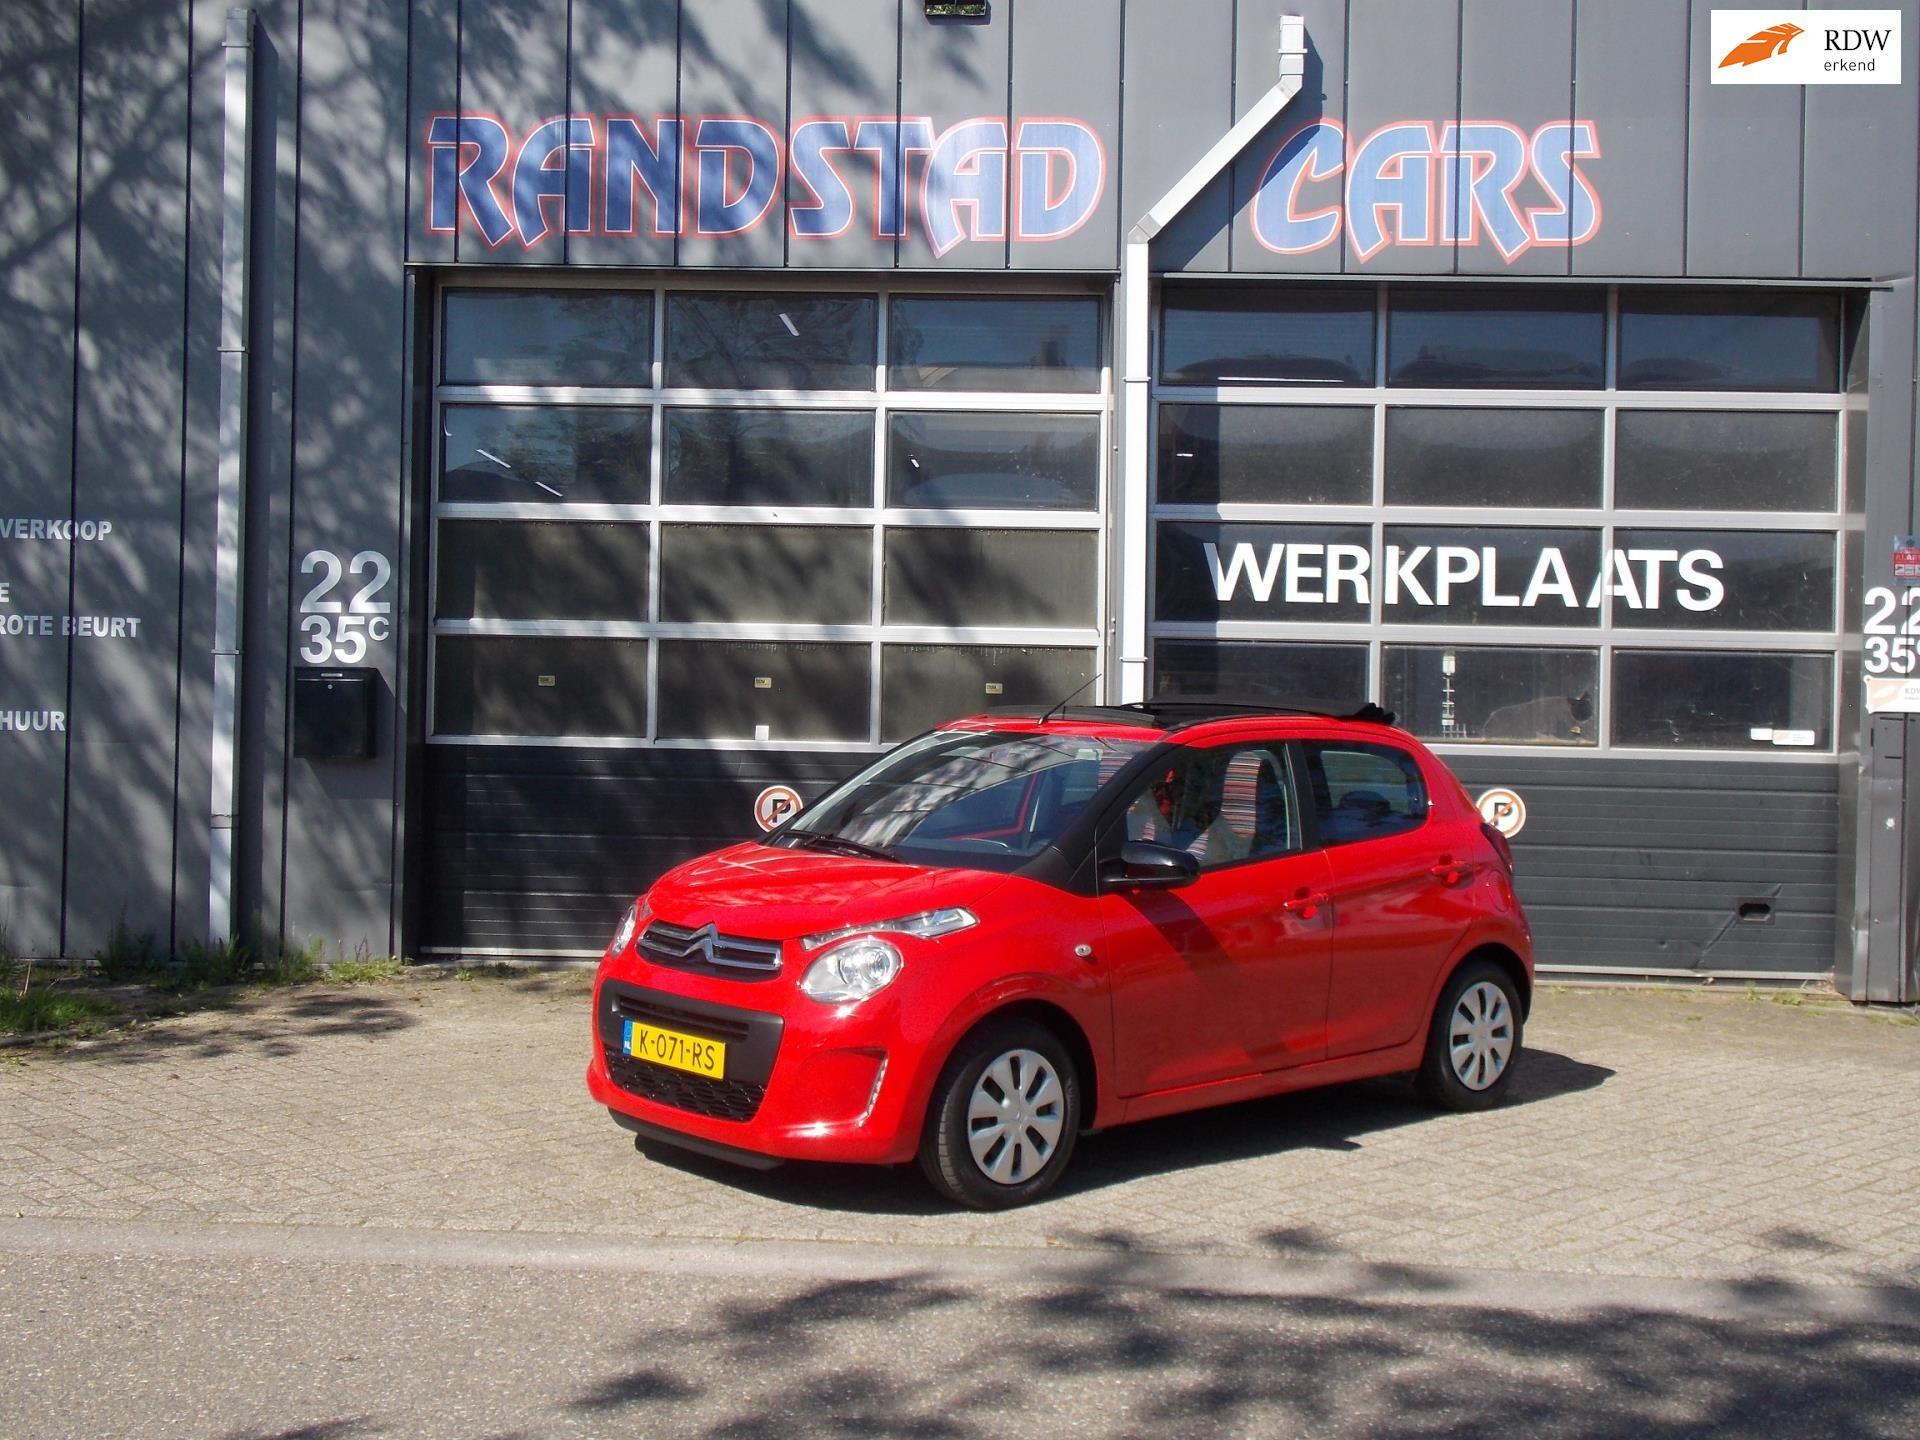 Citroen C1 occasion - Randstad Cars